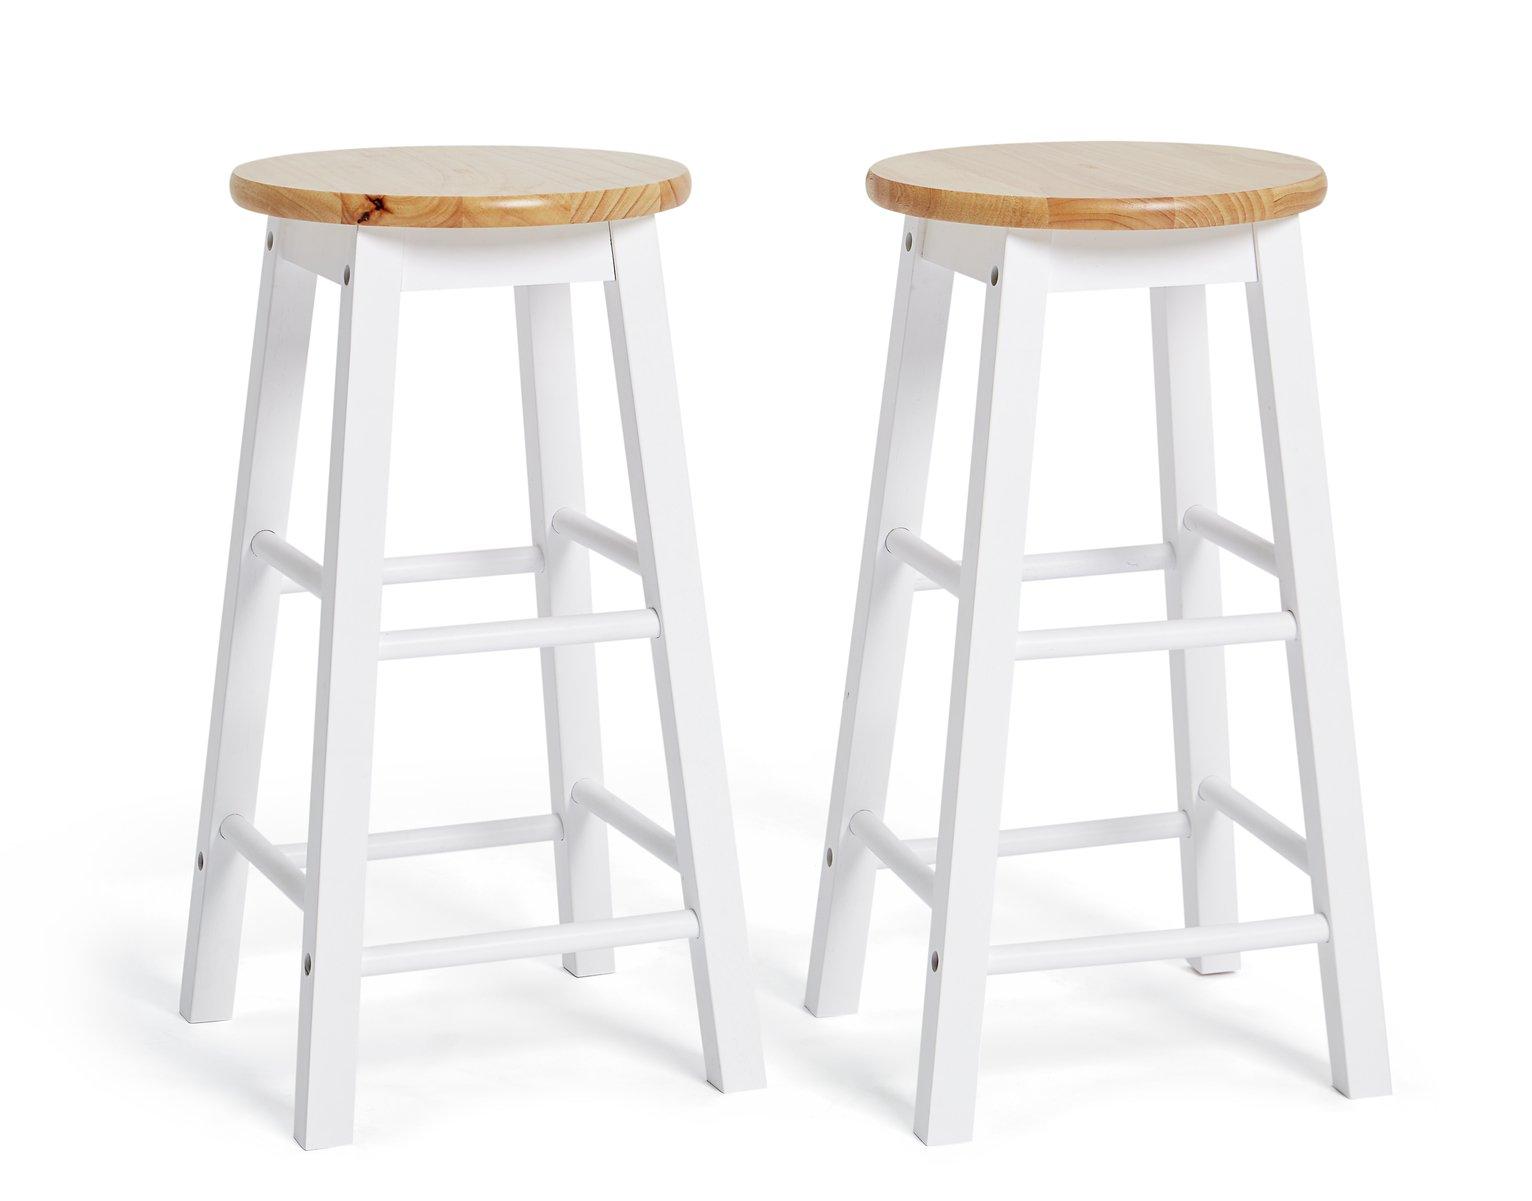 Habitat Pair of Wooden Bar stools - Two Tone